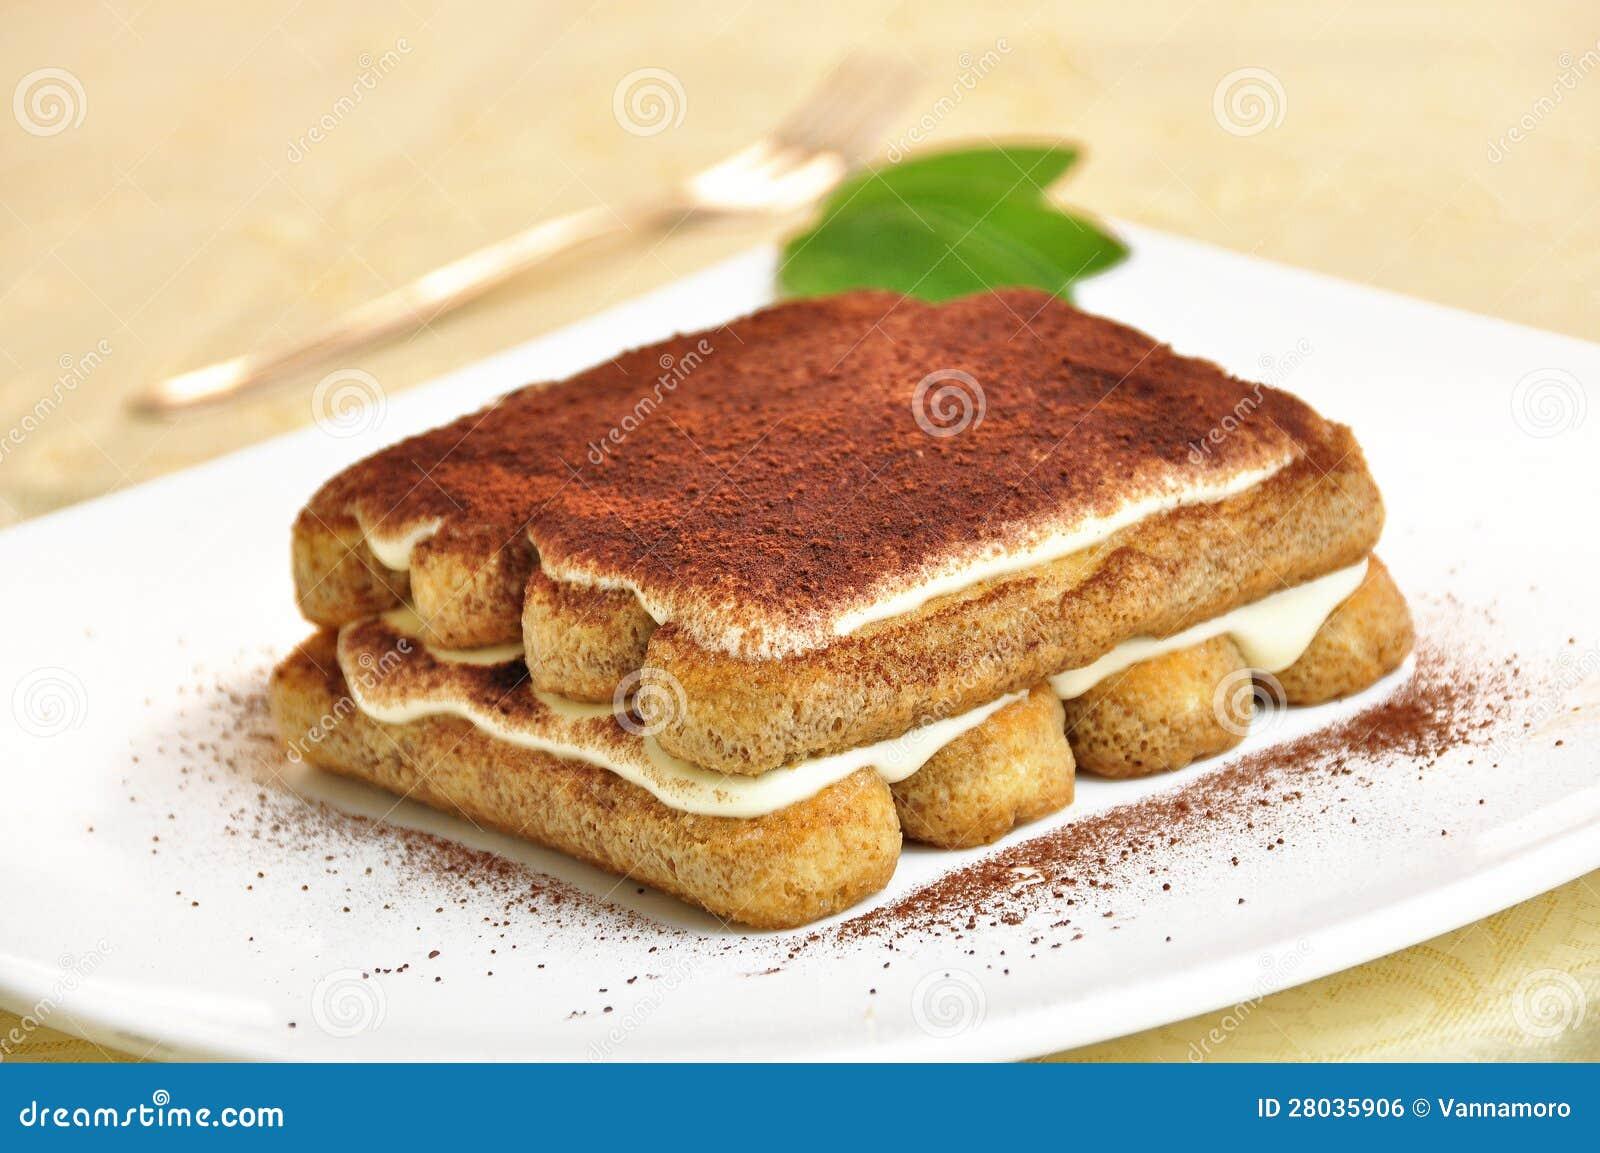 Tiramisu stock photo. Image of nutrition, additive, cookie..